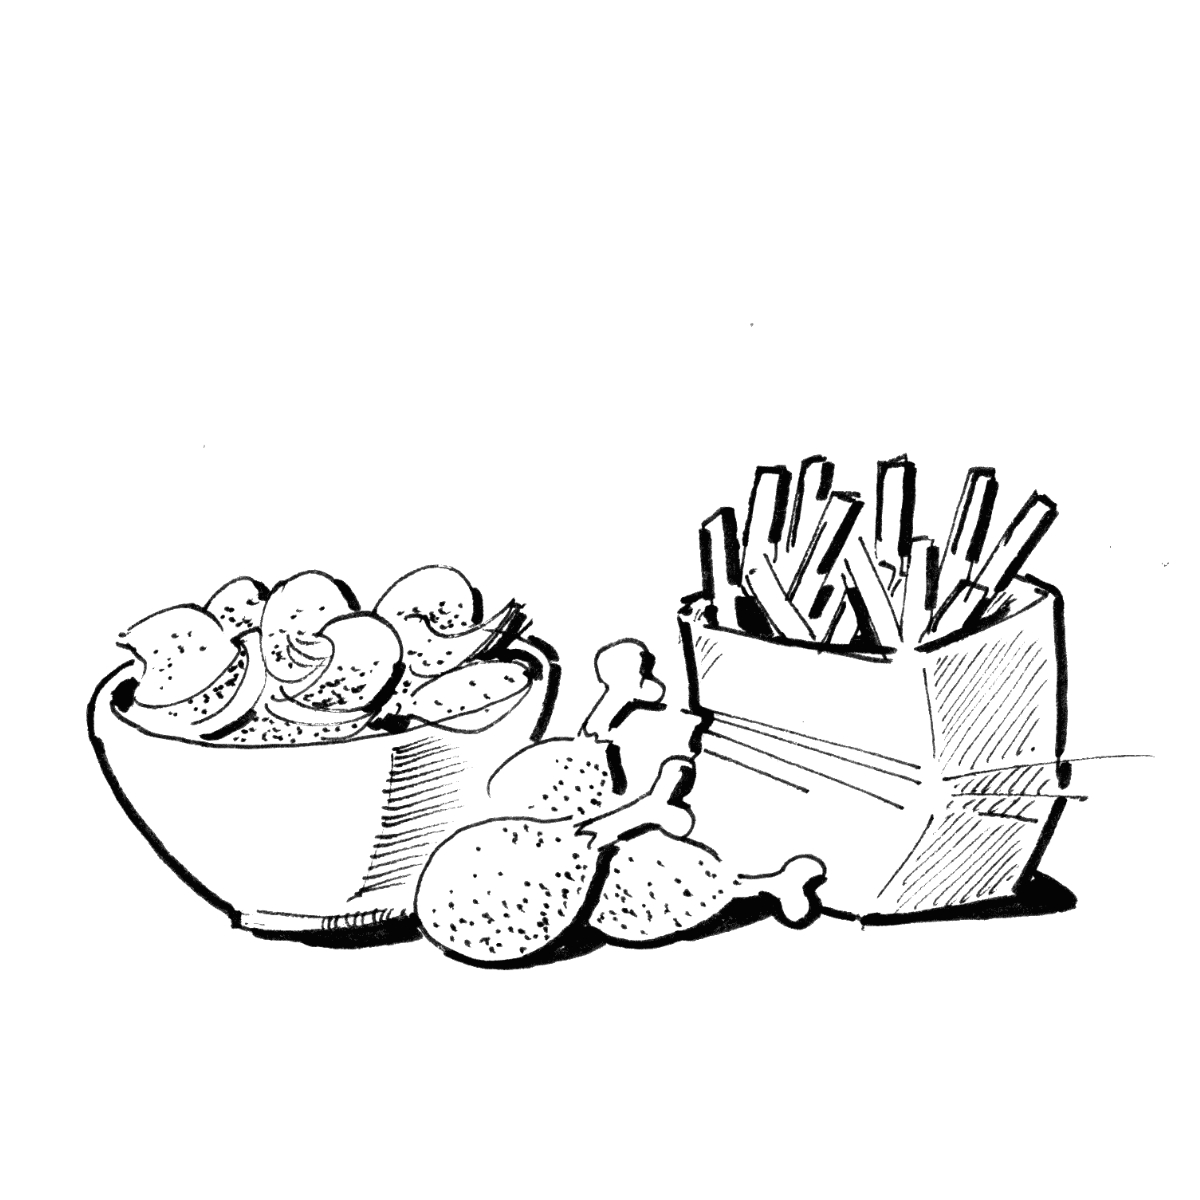 08-vignette-food-menu-hardcore-daouble-fingerfood.jpg